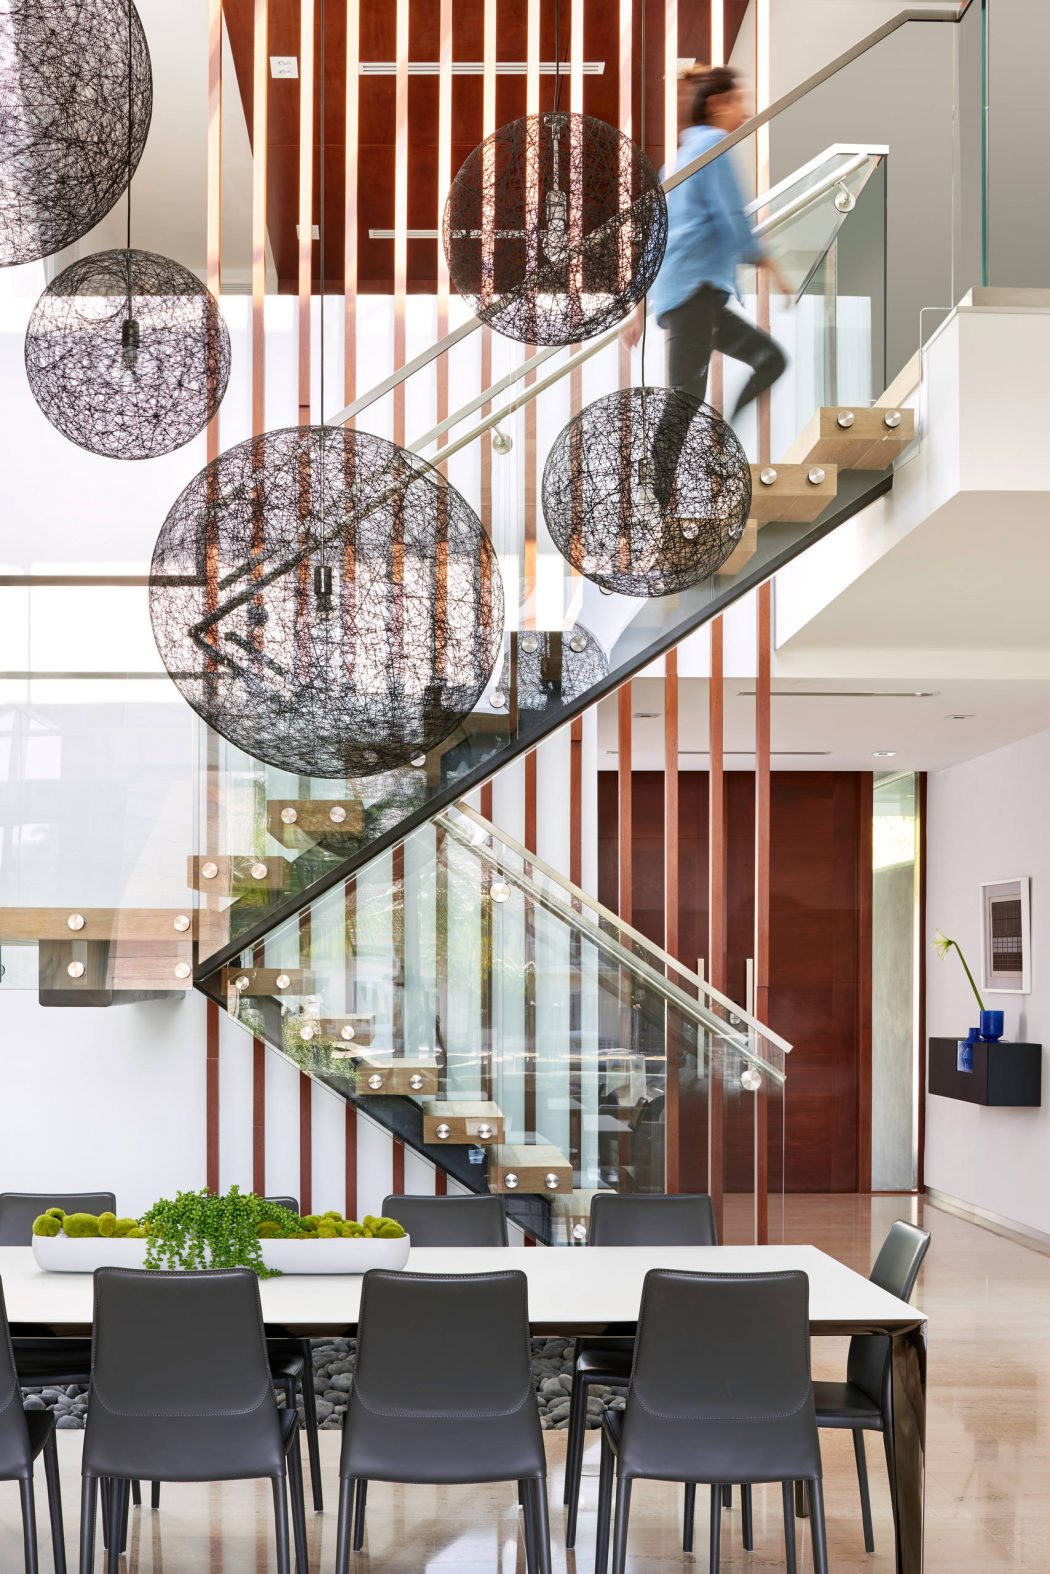 Miami Splendor - Amazing Two-story Family House - the internal staircase